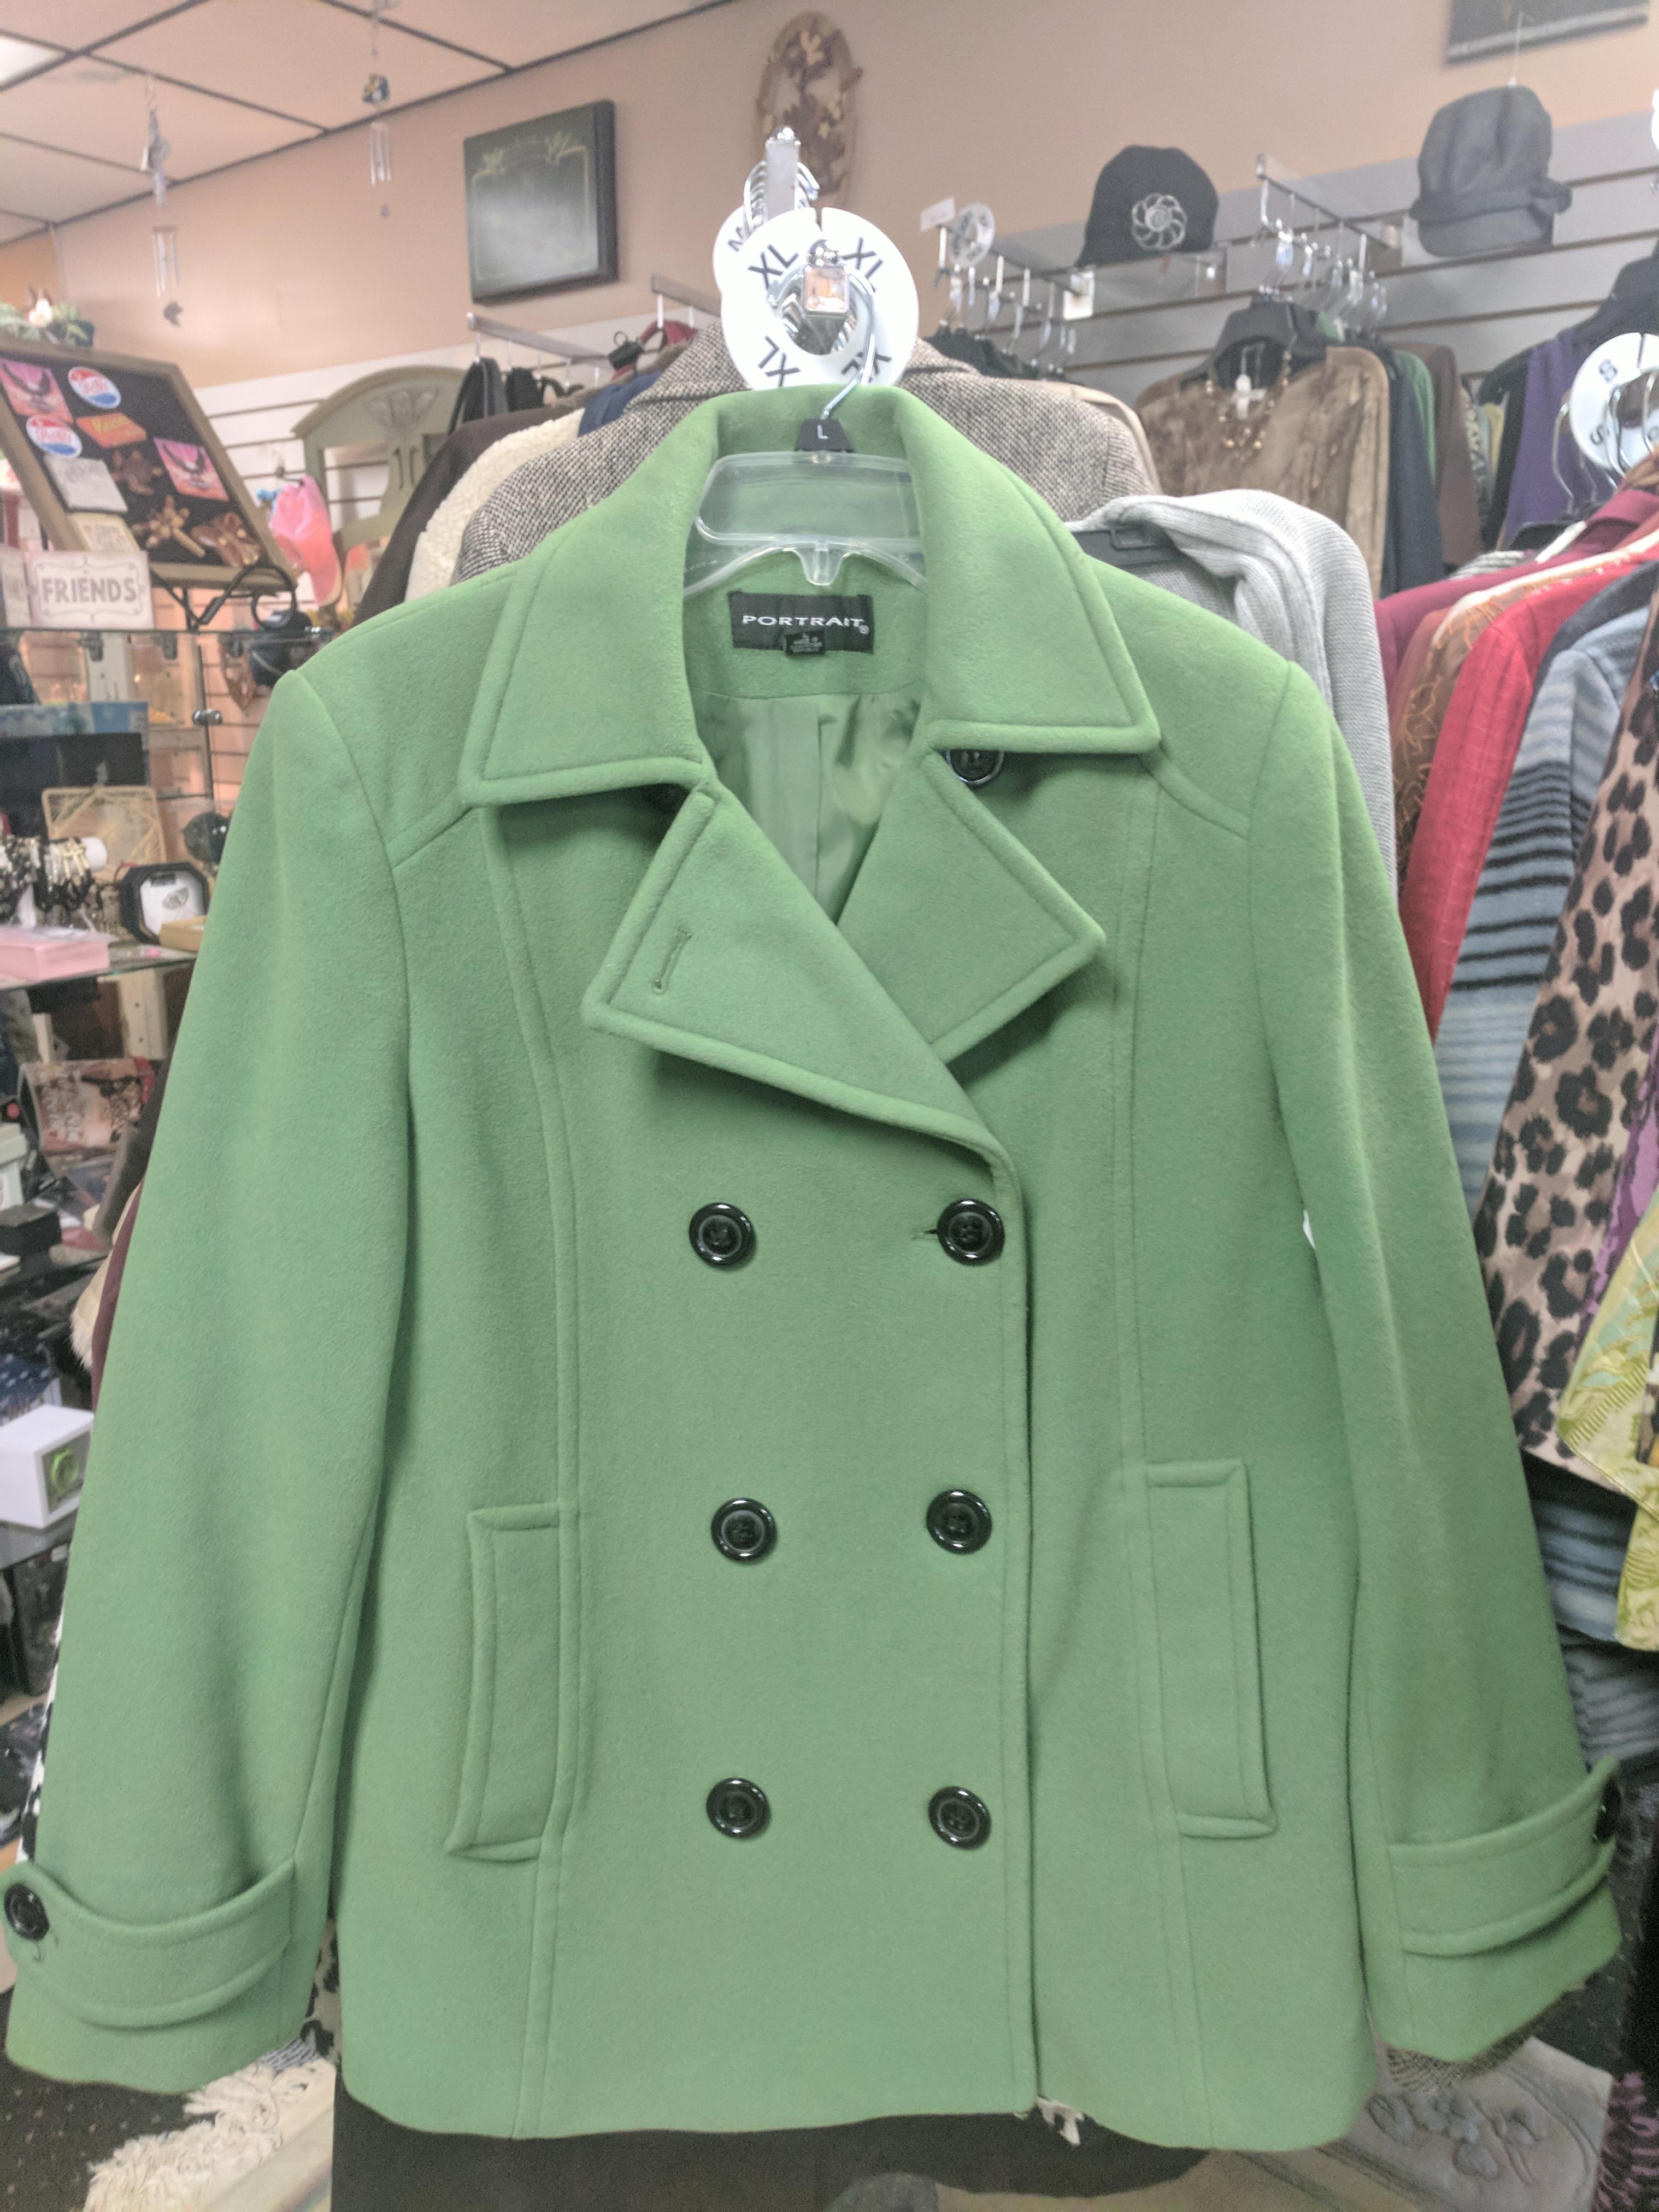 Career fashion consignment atlanta 11